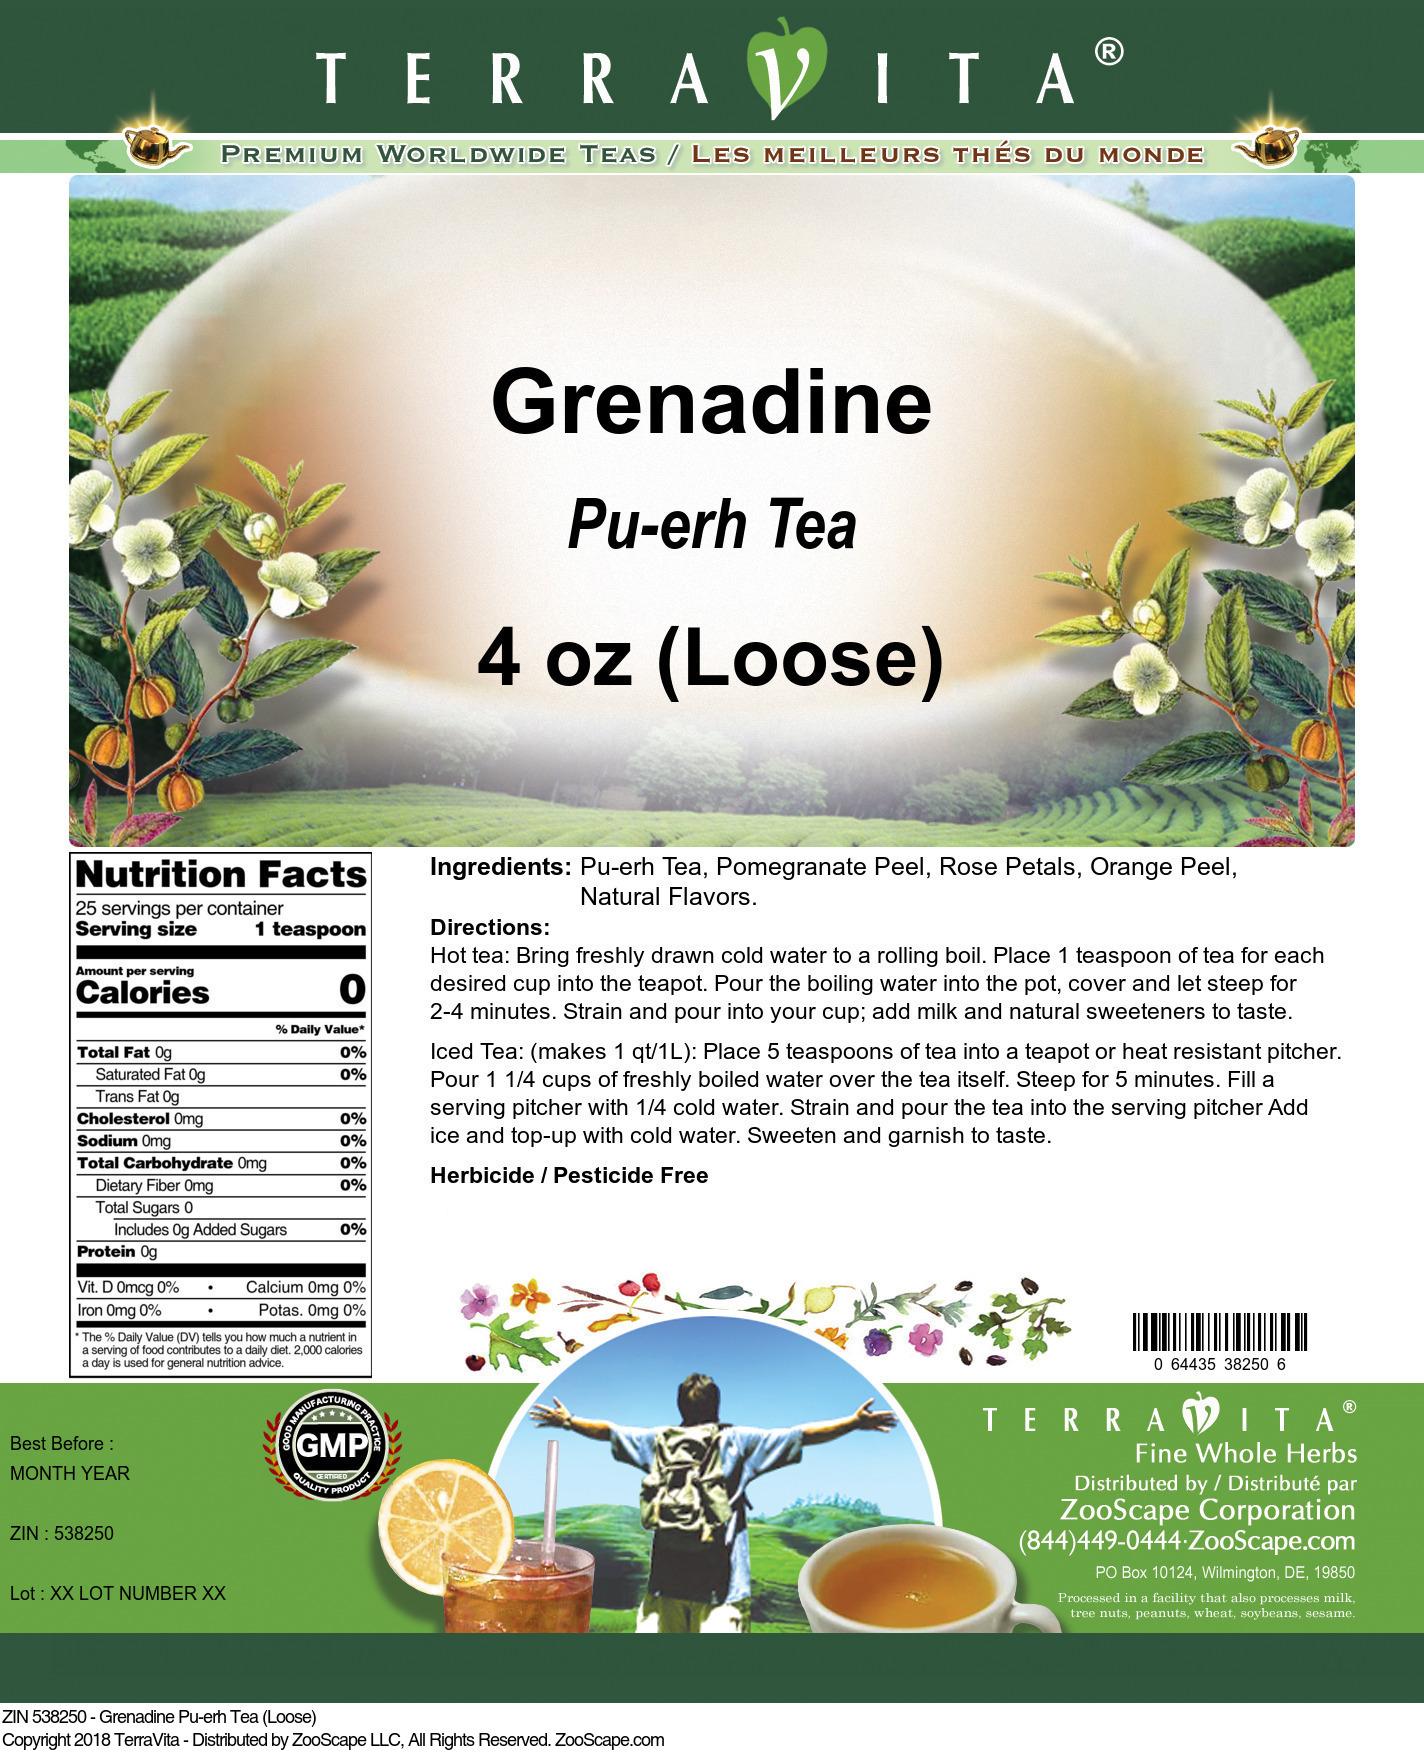 Grenadine Pu-erh Tea (Loose)